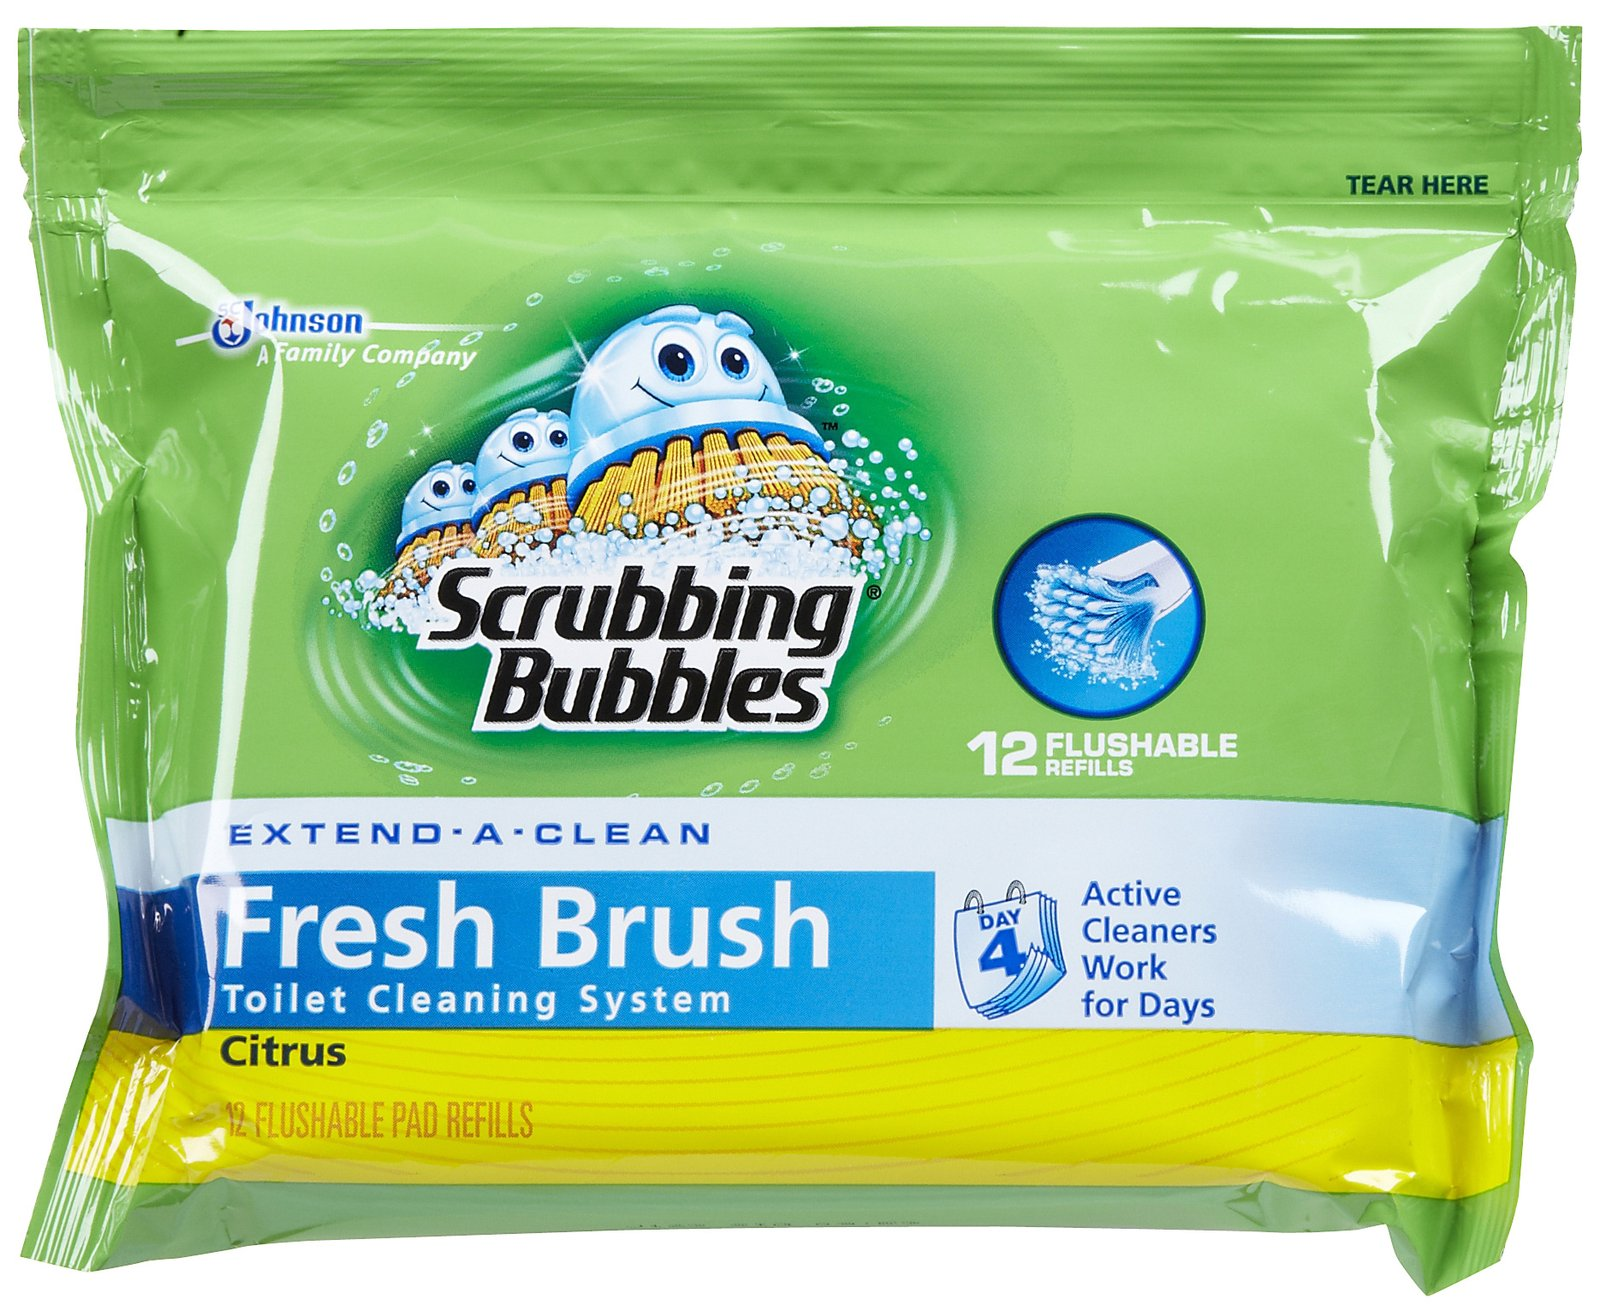 Scrubbing bubbles coupon $5